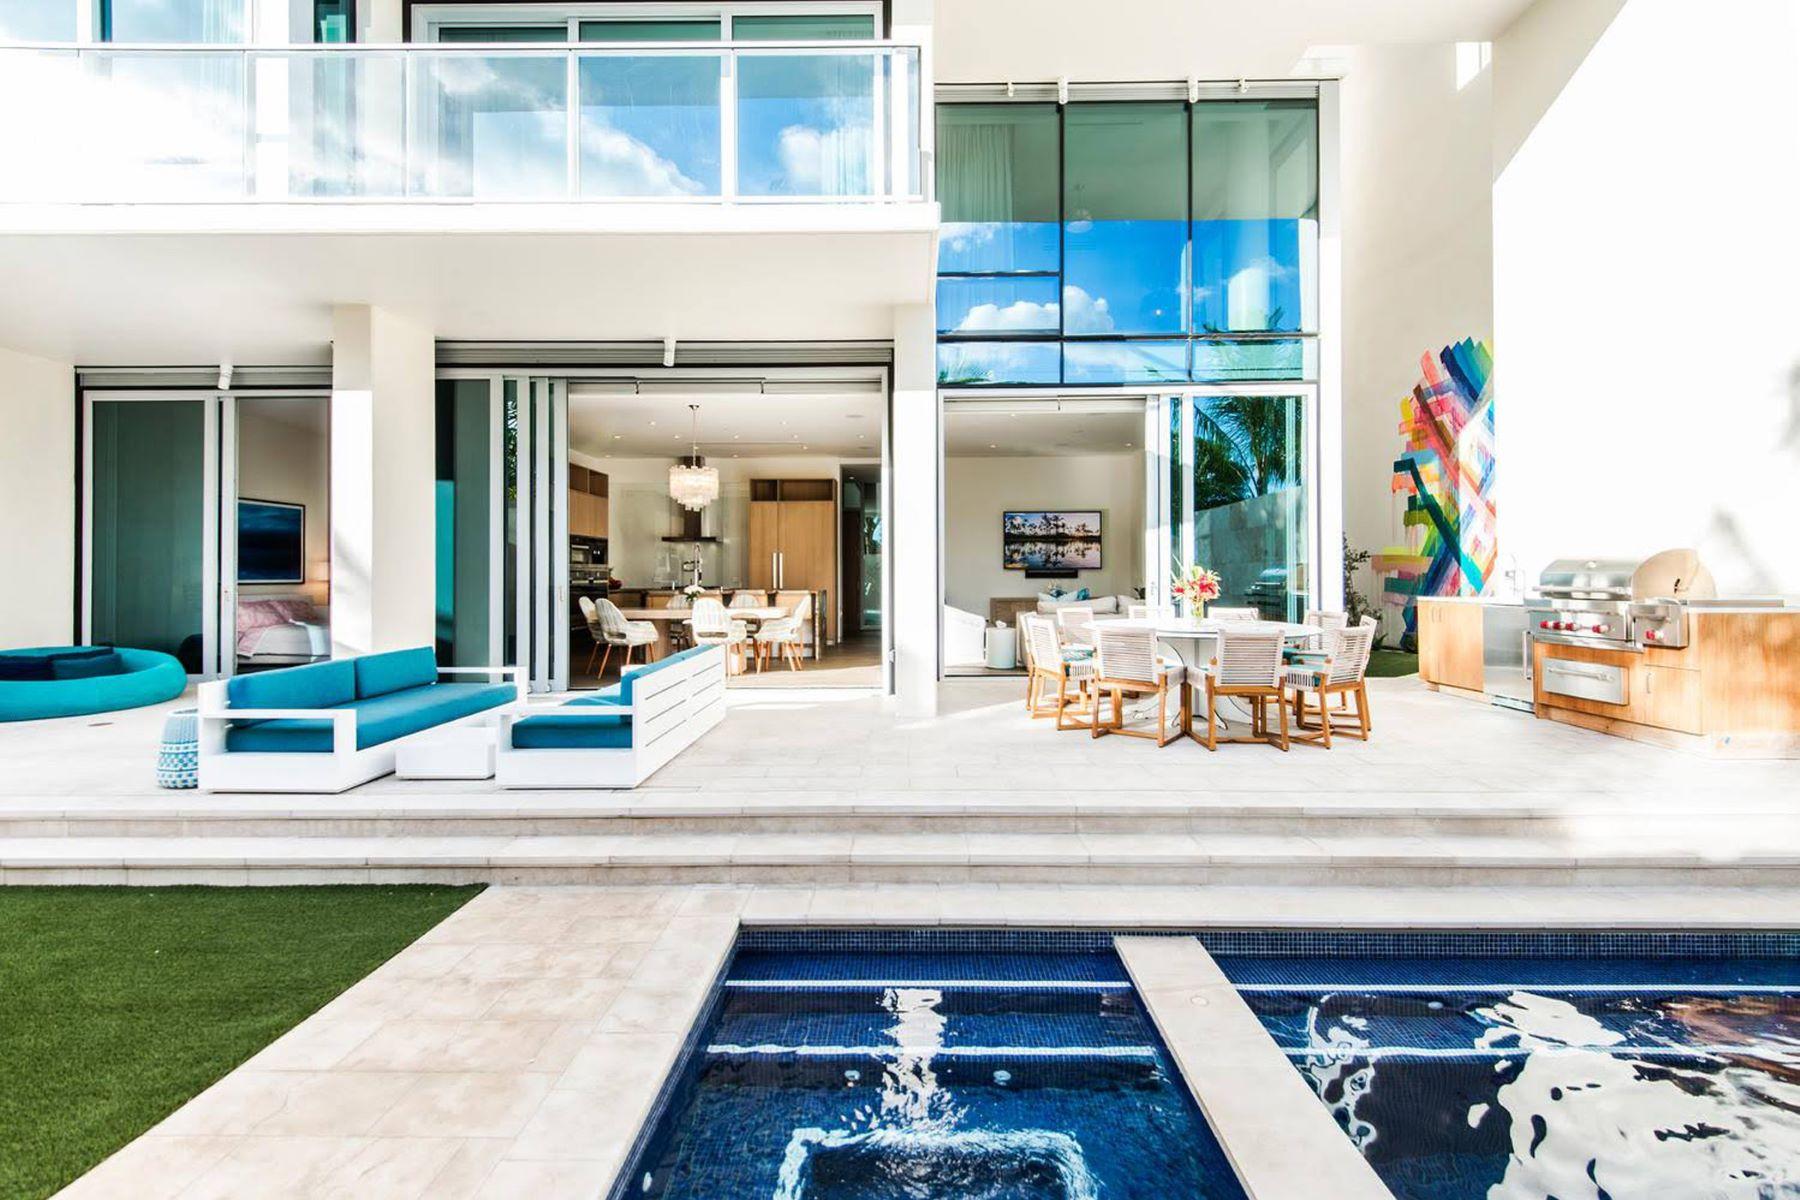 Condominium for Active at Townhouse, Kakaako, Waiea, Luxury Townhouse, Ala Moana 1118 Ala Moana Blvd Villa 2 Honolulu, Hawaii 96814 United States